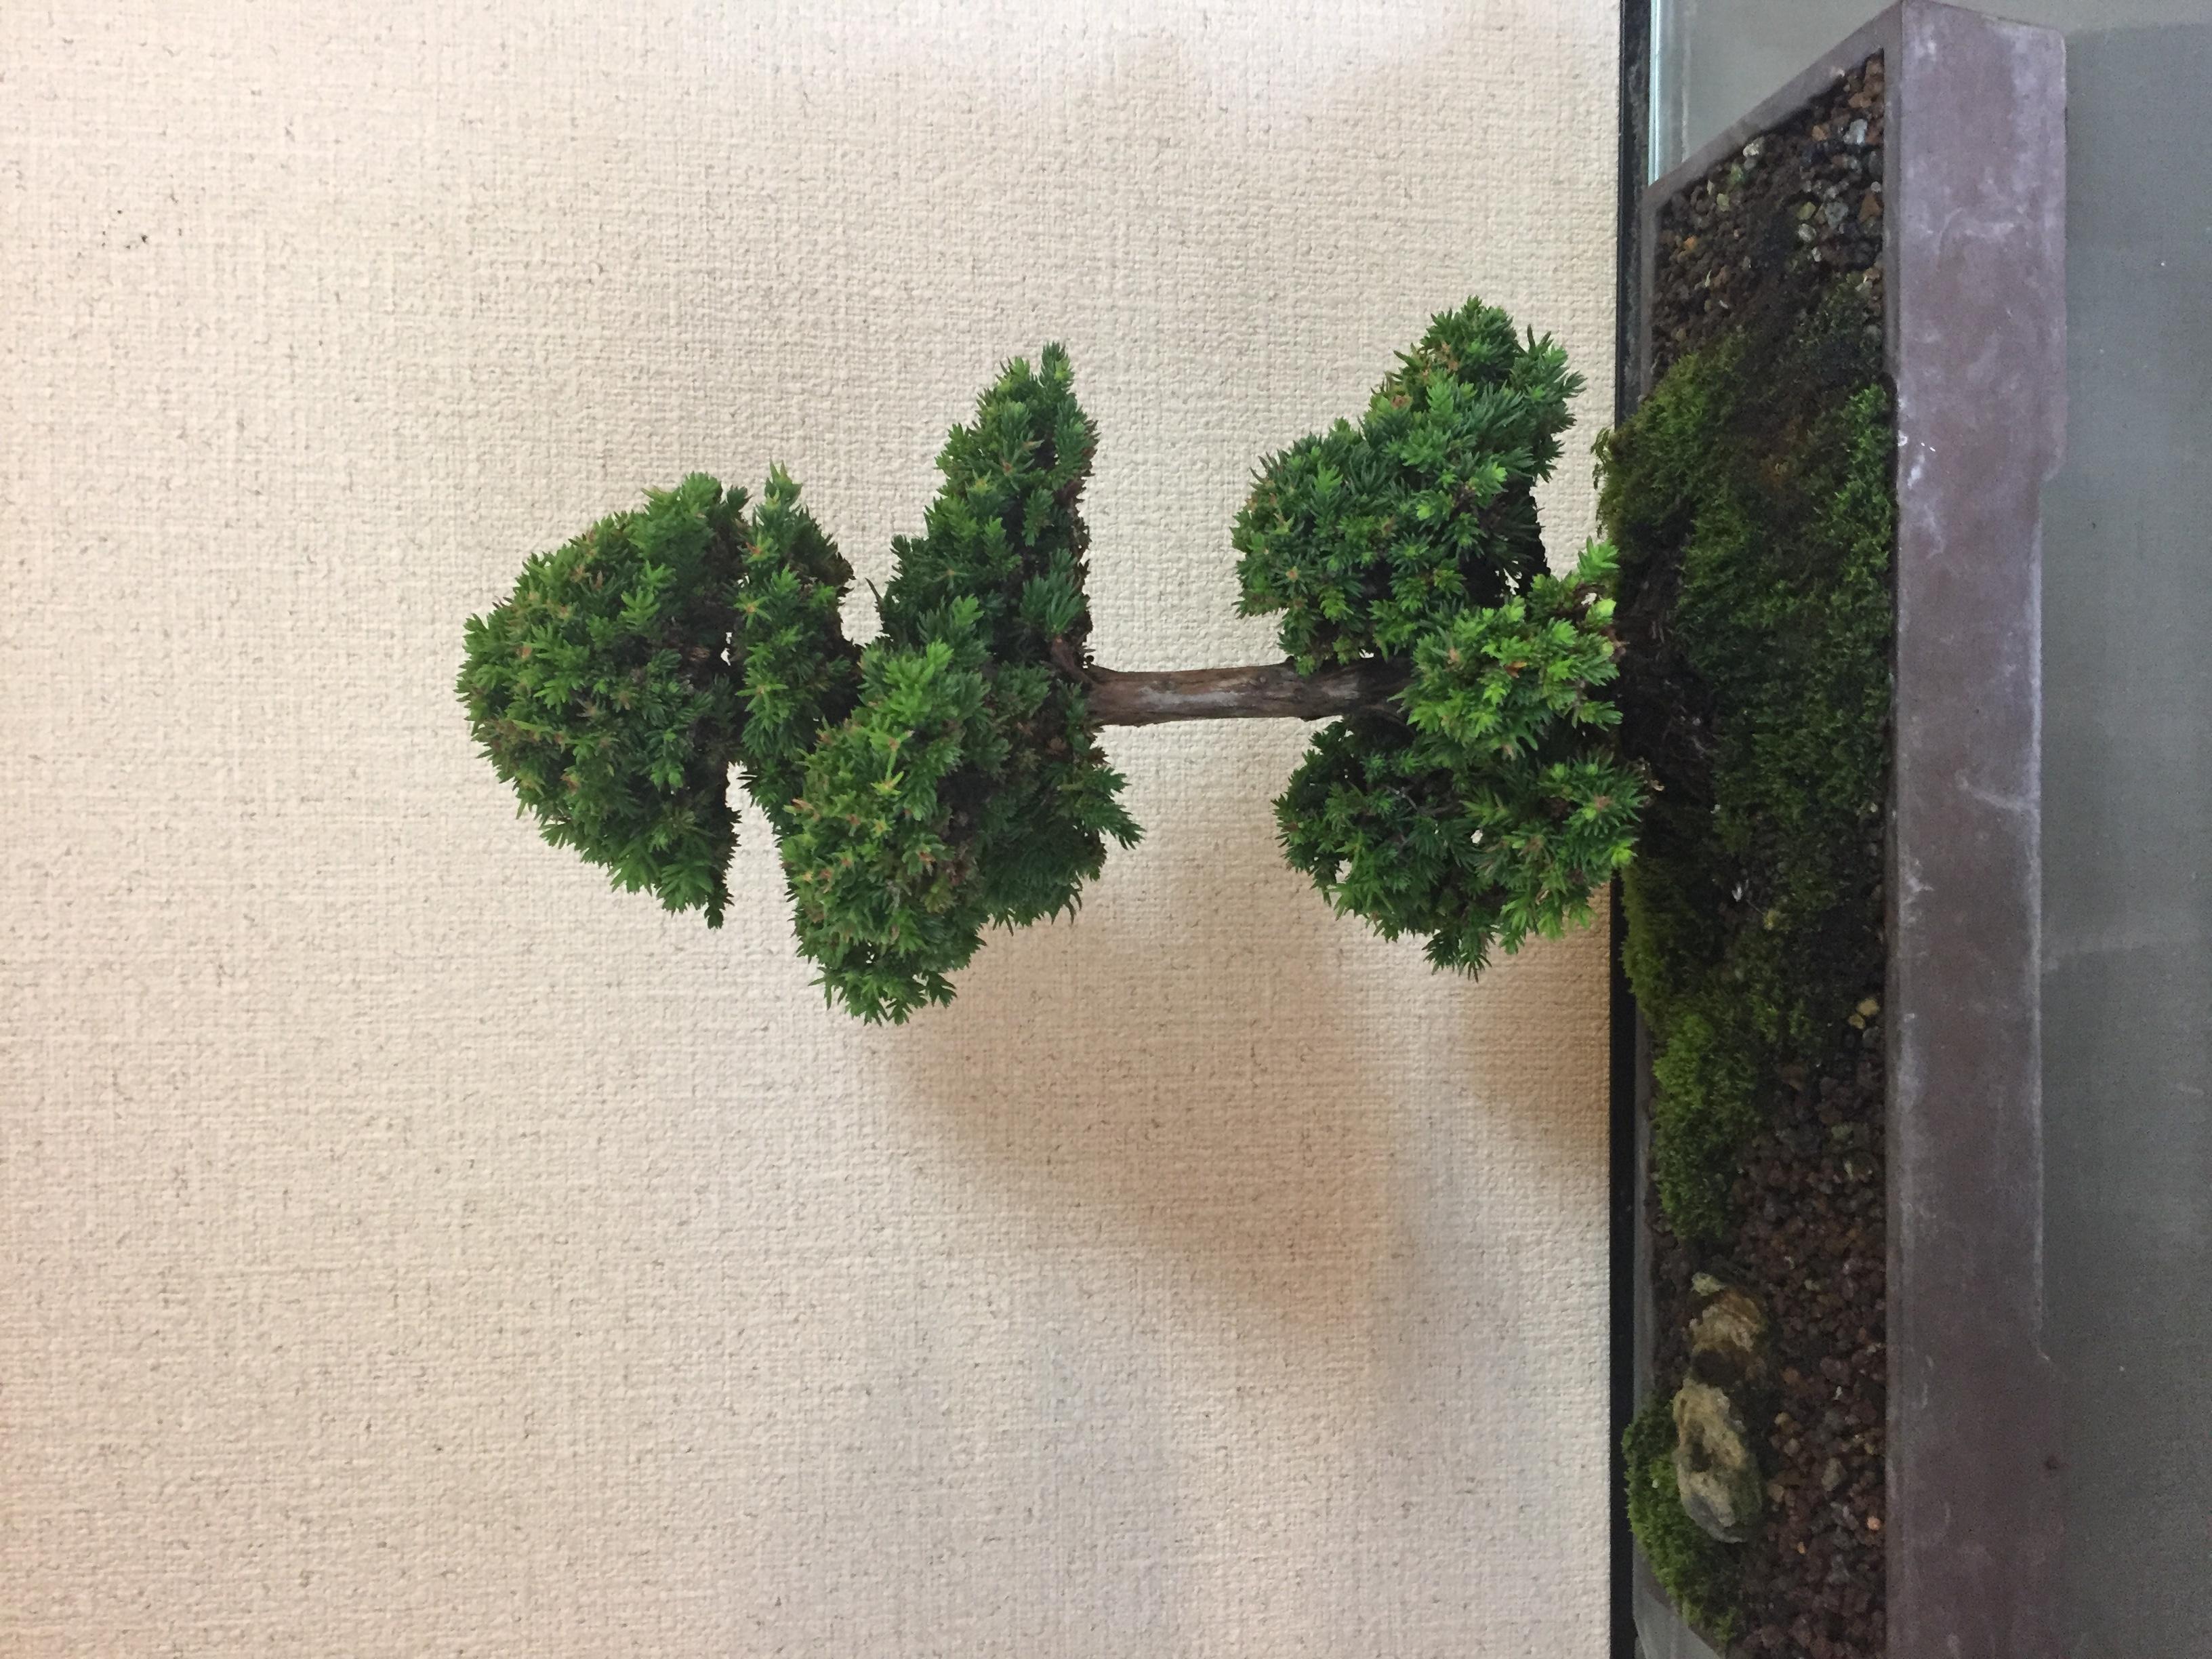 成彦 Shigehiko 盆栽 Bonsai / 杉 スギ